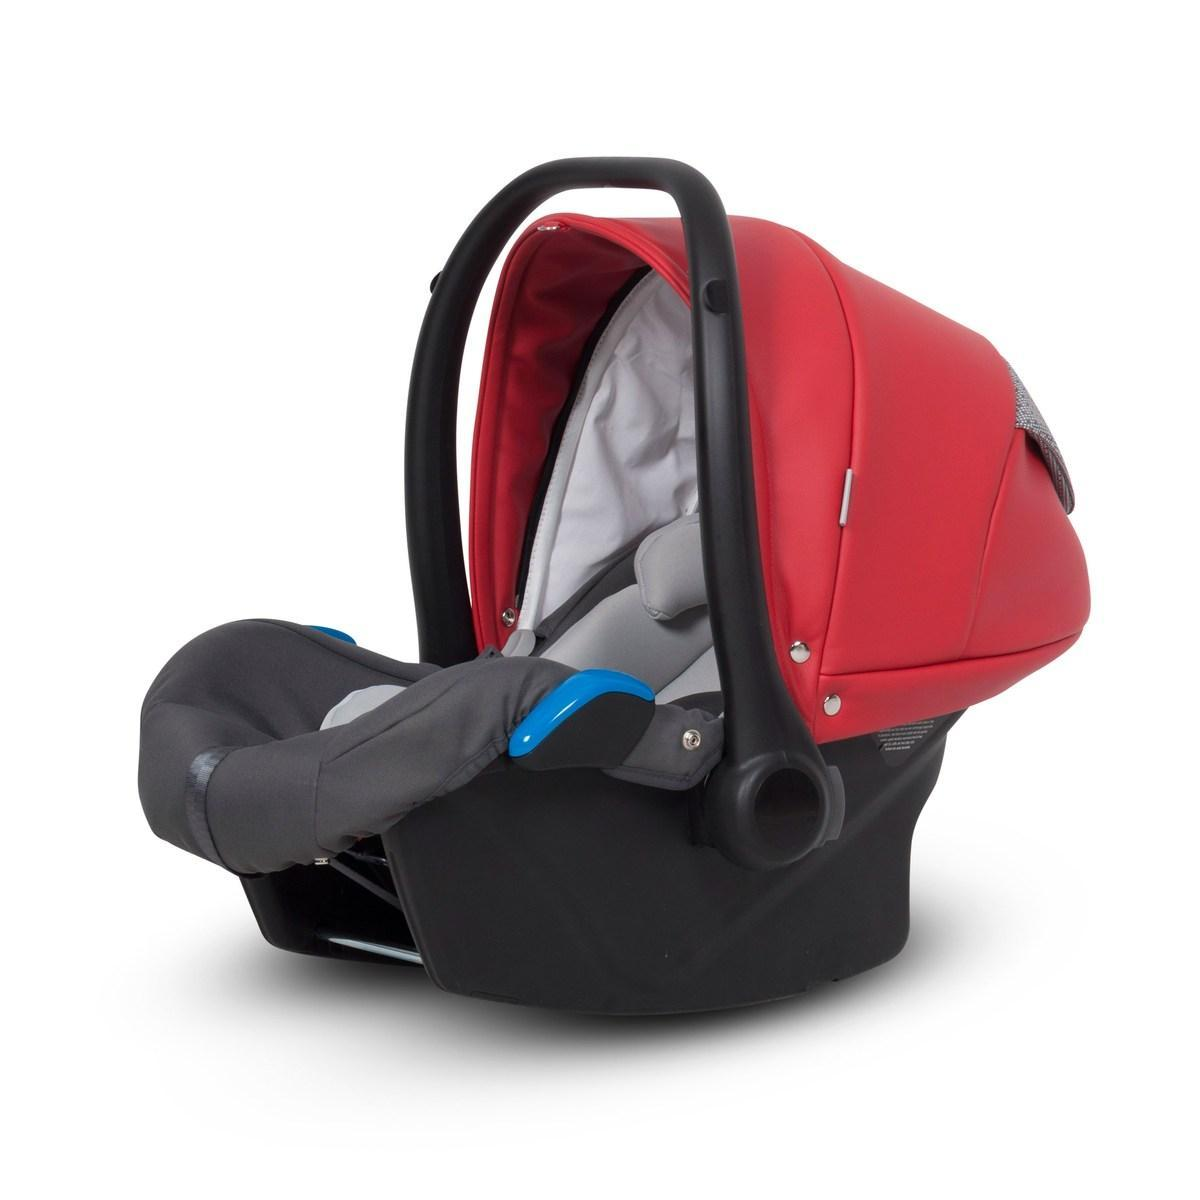 Детское автокресло Expander Xenon 03 Scarlet